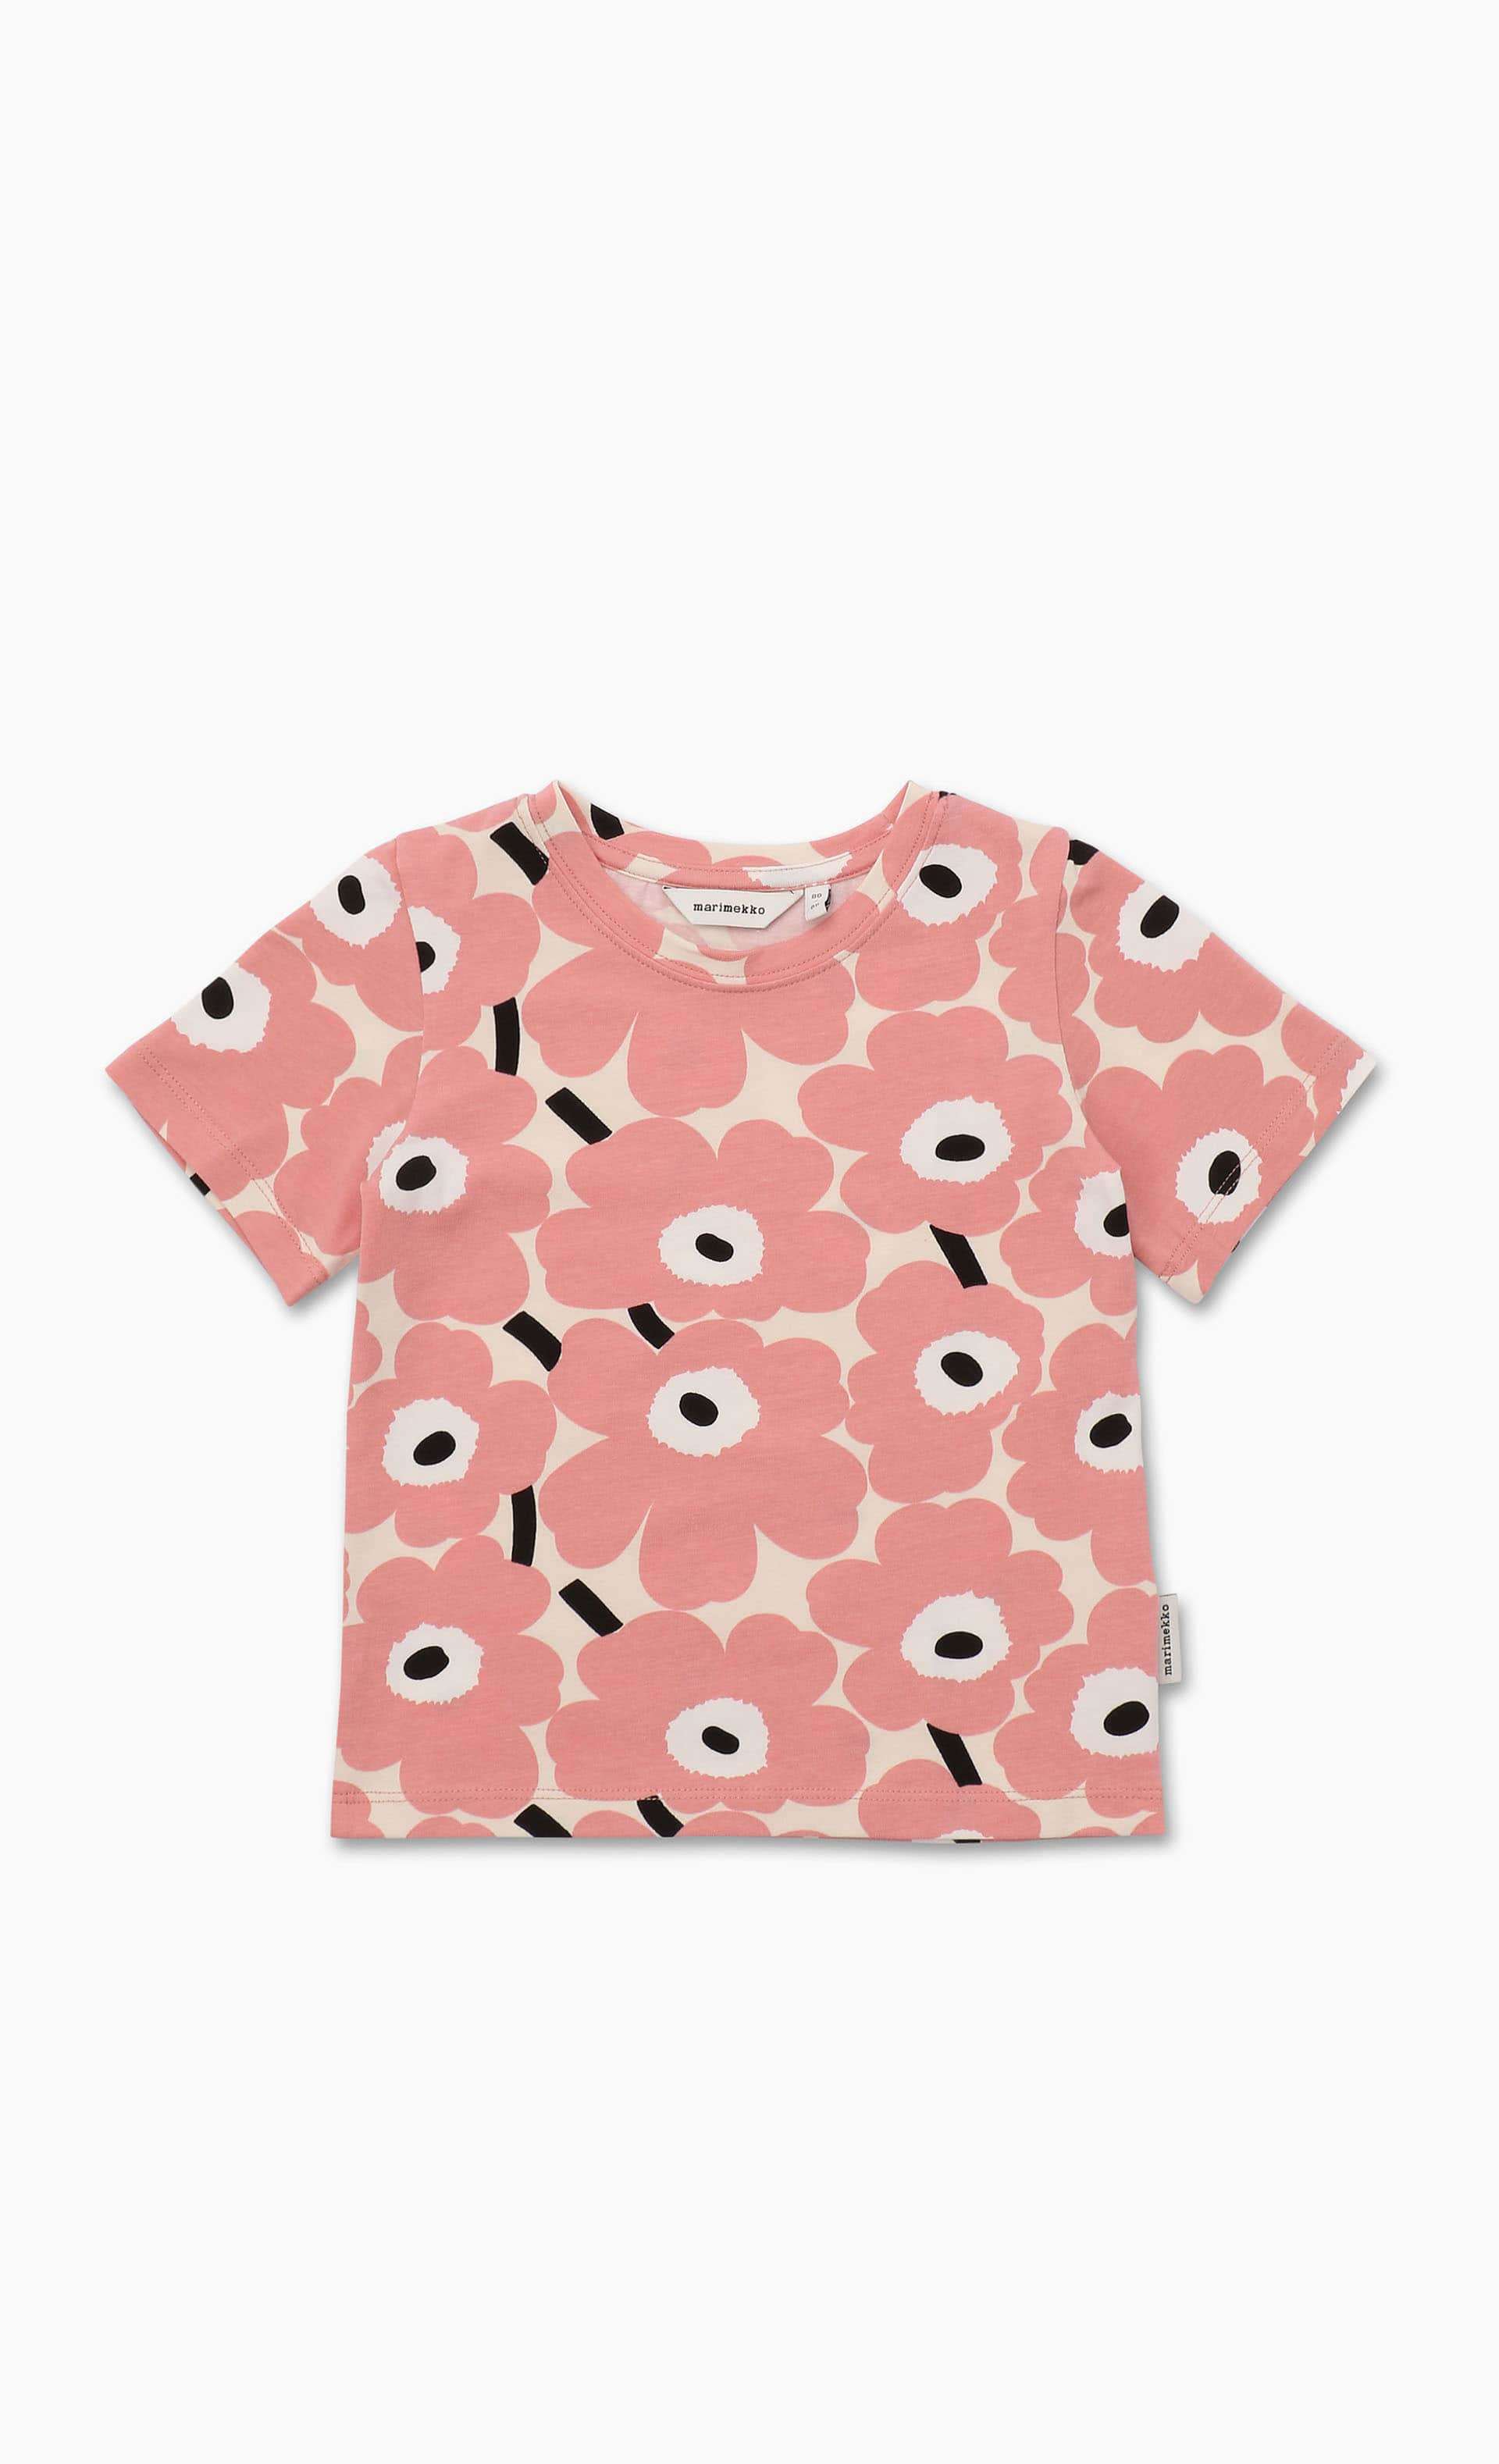 [Kids]Soida Mini Unikot 1 Tシャツ